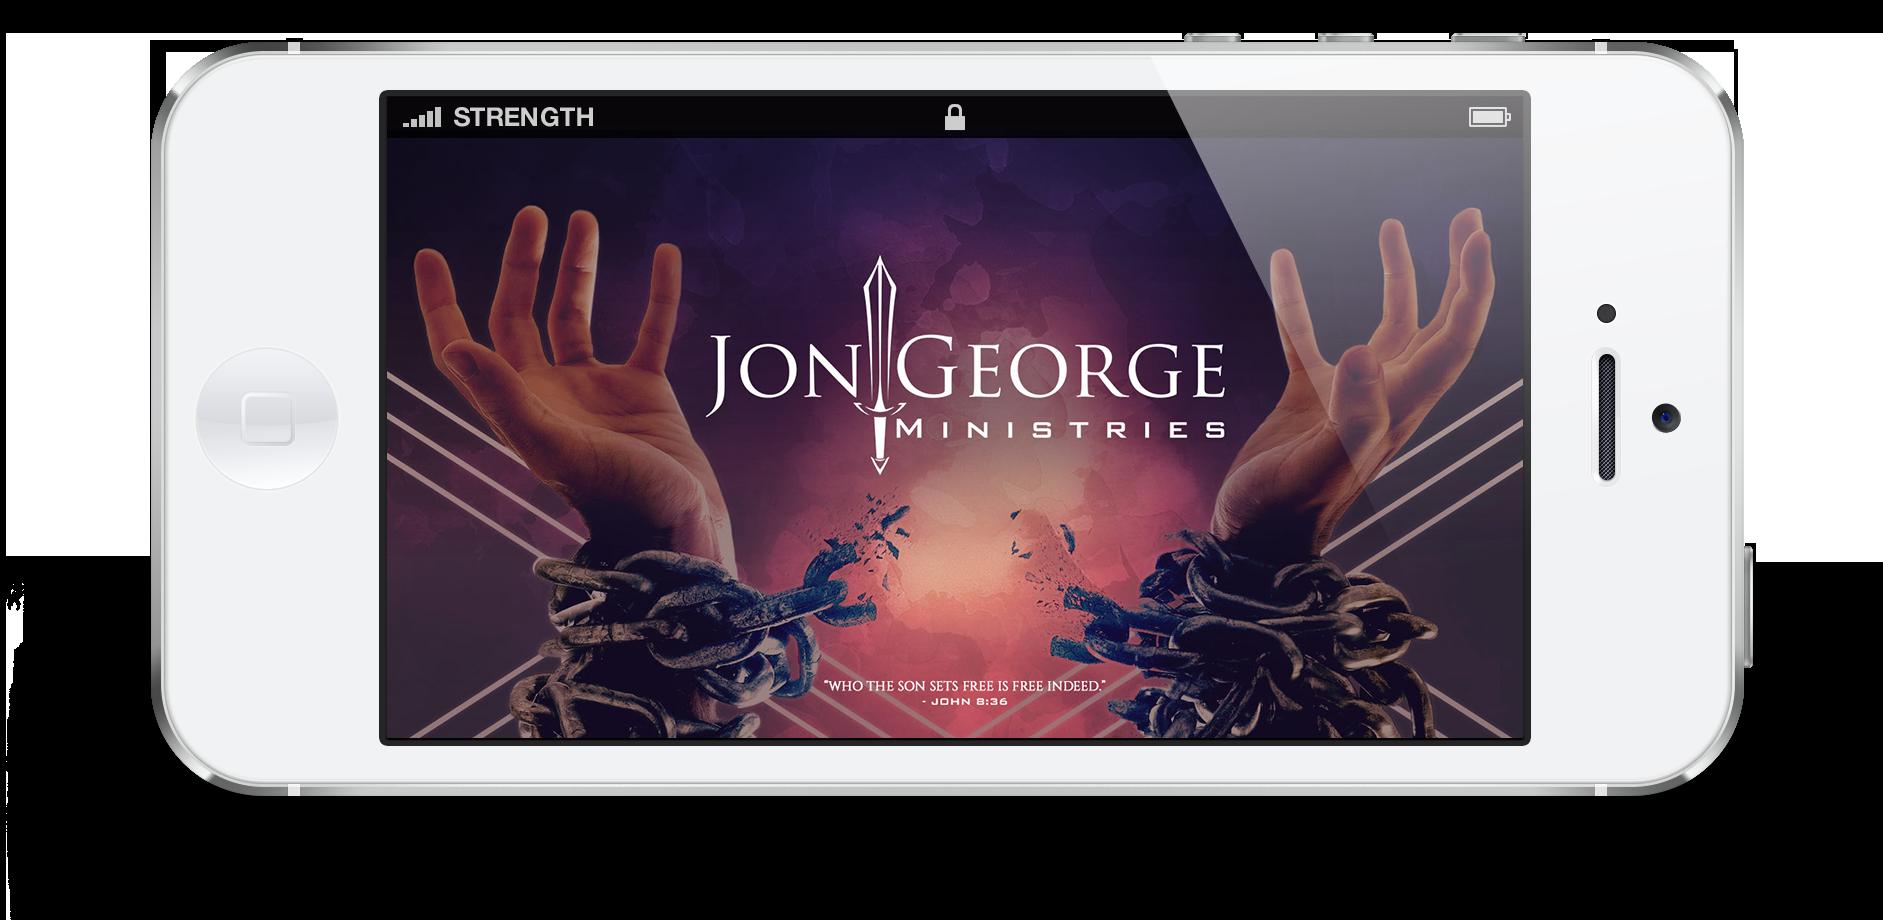 Jon George Ministries Mobile App